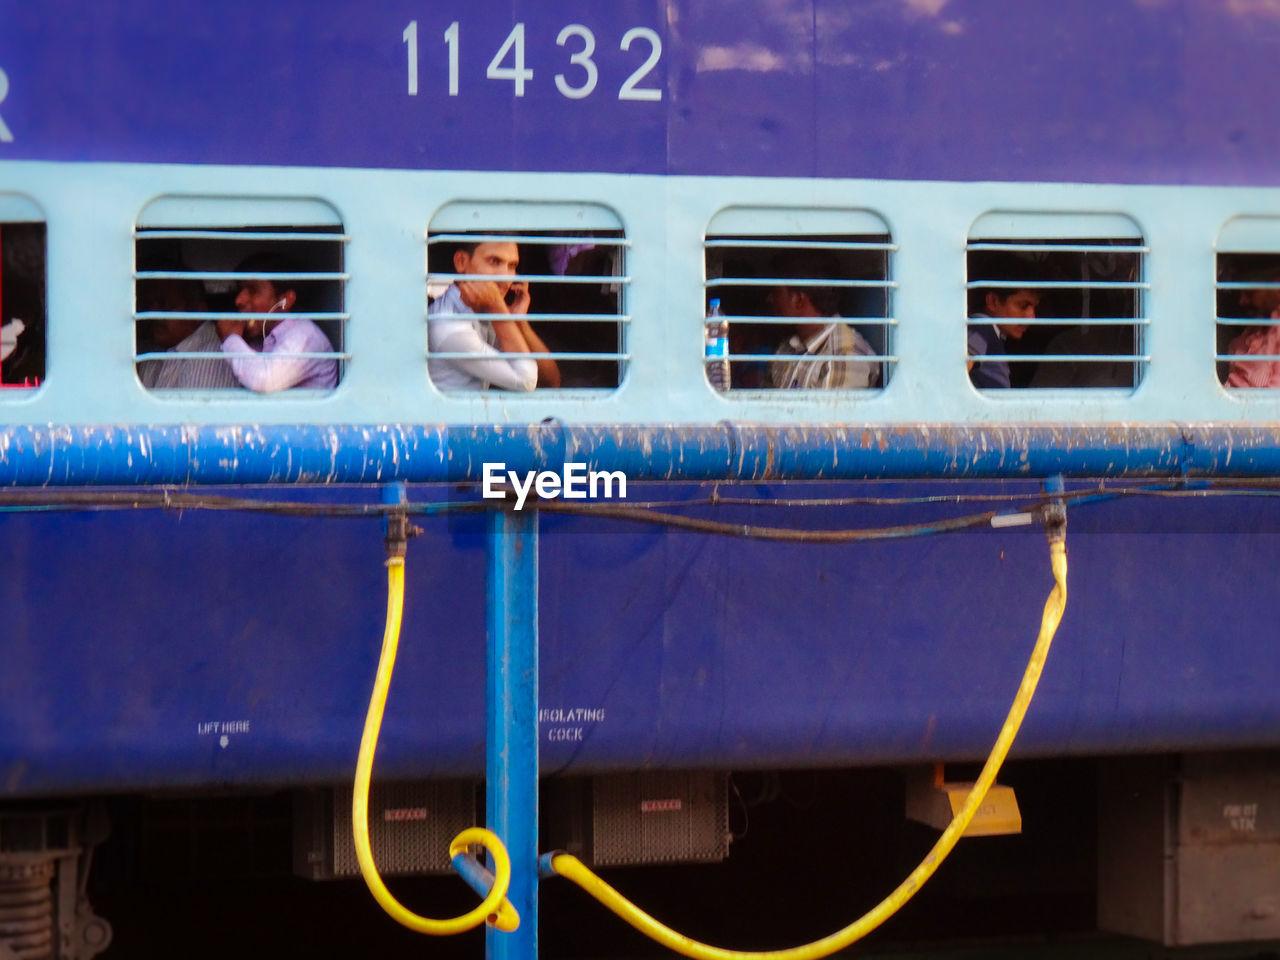 mode of transport, transportation, train - vehicle, public transportation, land vehicle, communication, blue, day, men, outdoors